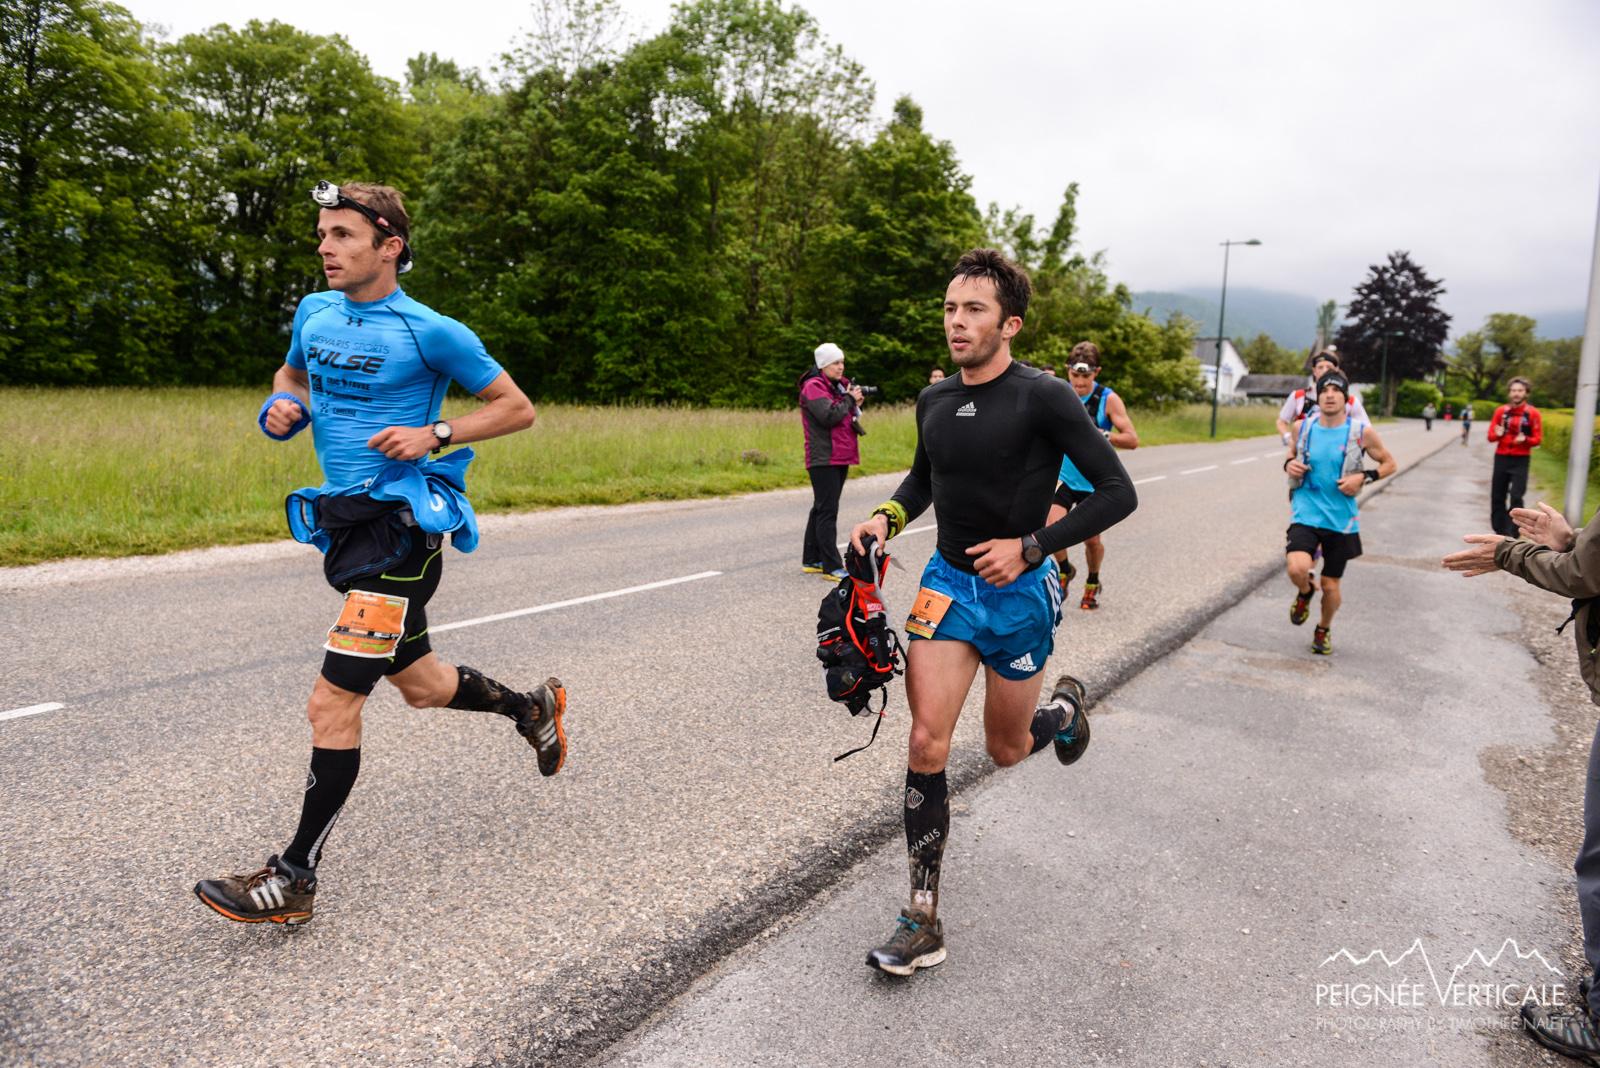 MaxiRace-Annecy-2014-Team-Hoka-Timothee-Nalet-0867.jpg